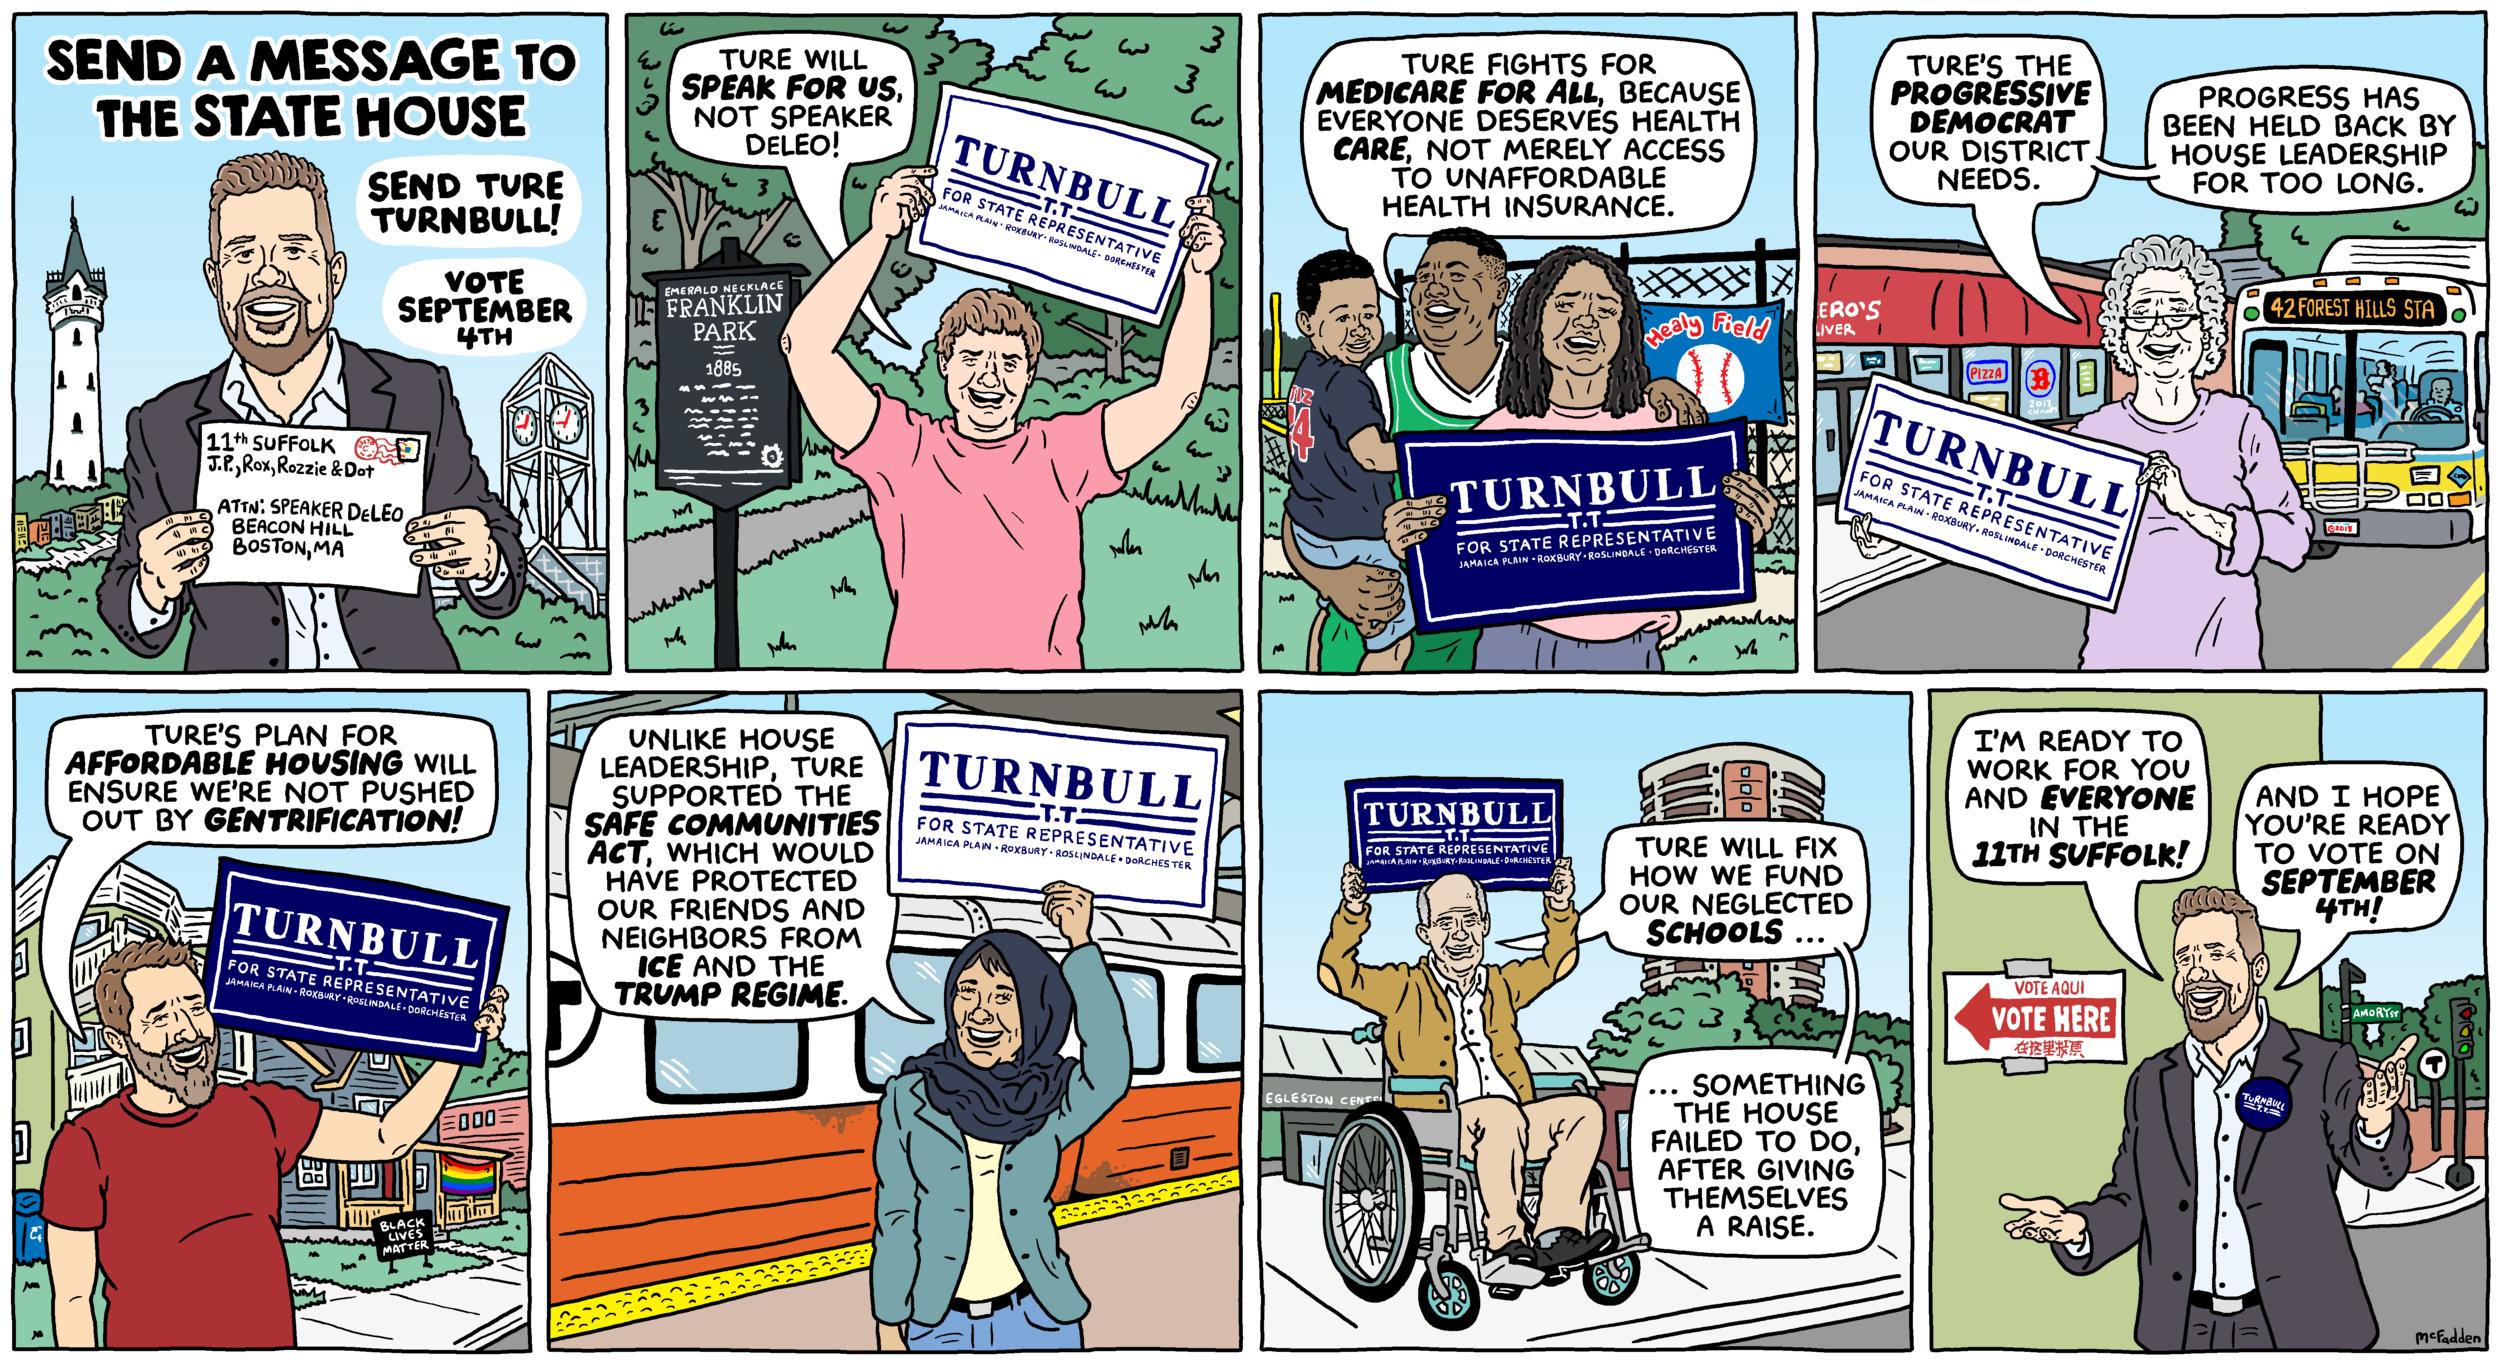 turnbull-comic-horizontal.png